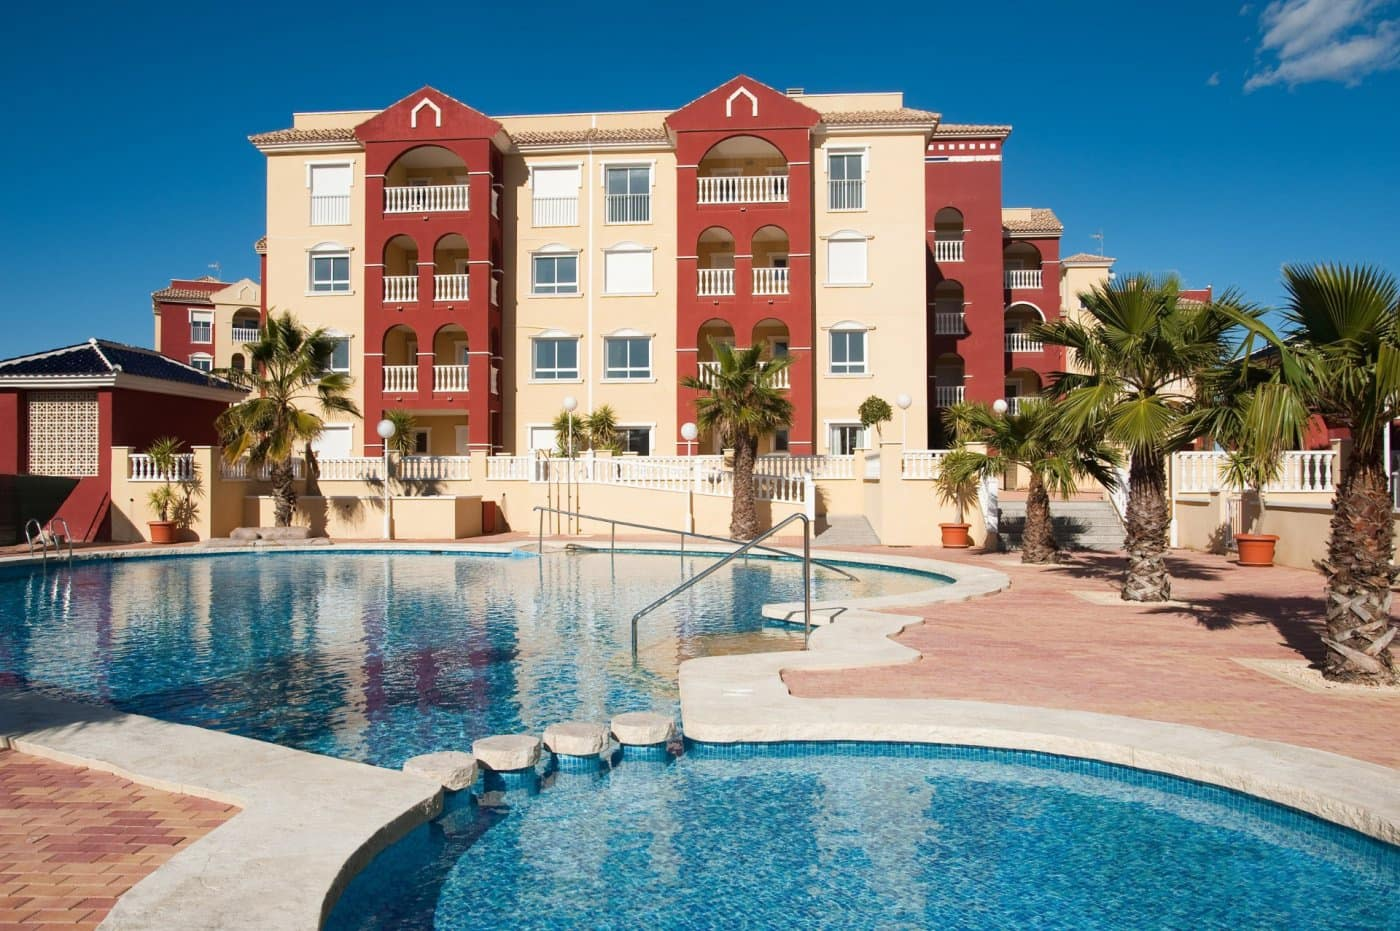 2 bedroom Apartment for sale in Los Alcazares with pool garage - € 159,000 (Ref: 5221180)